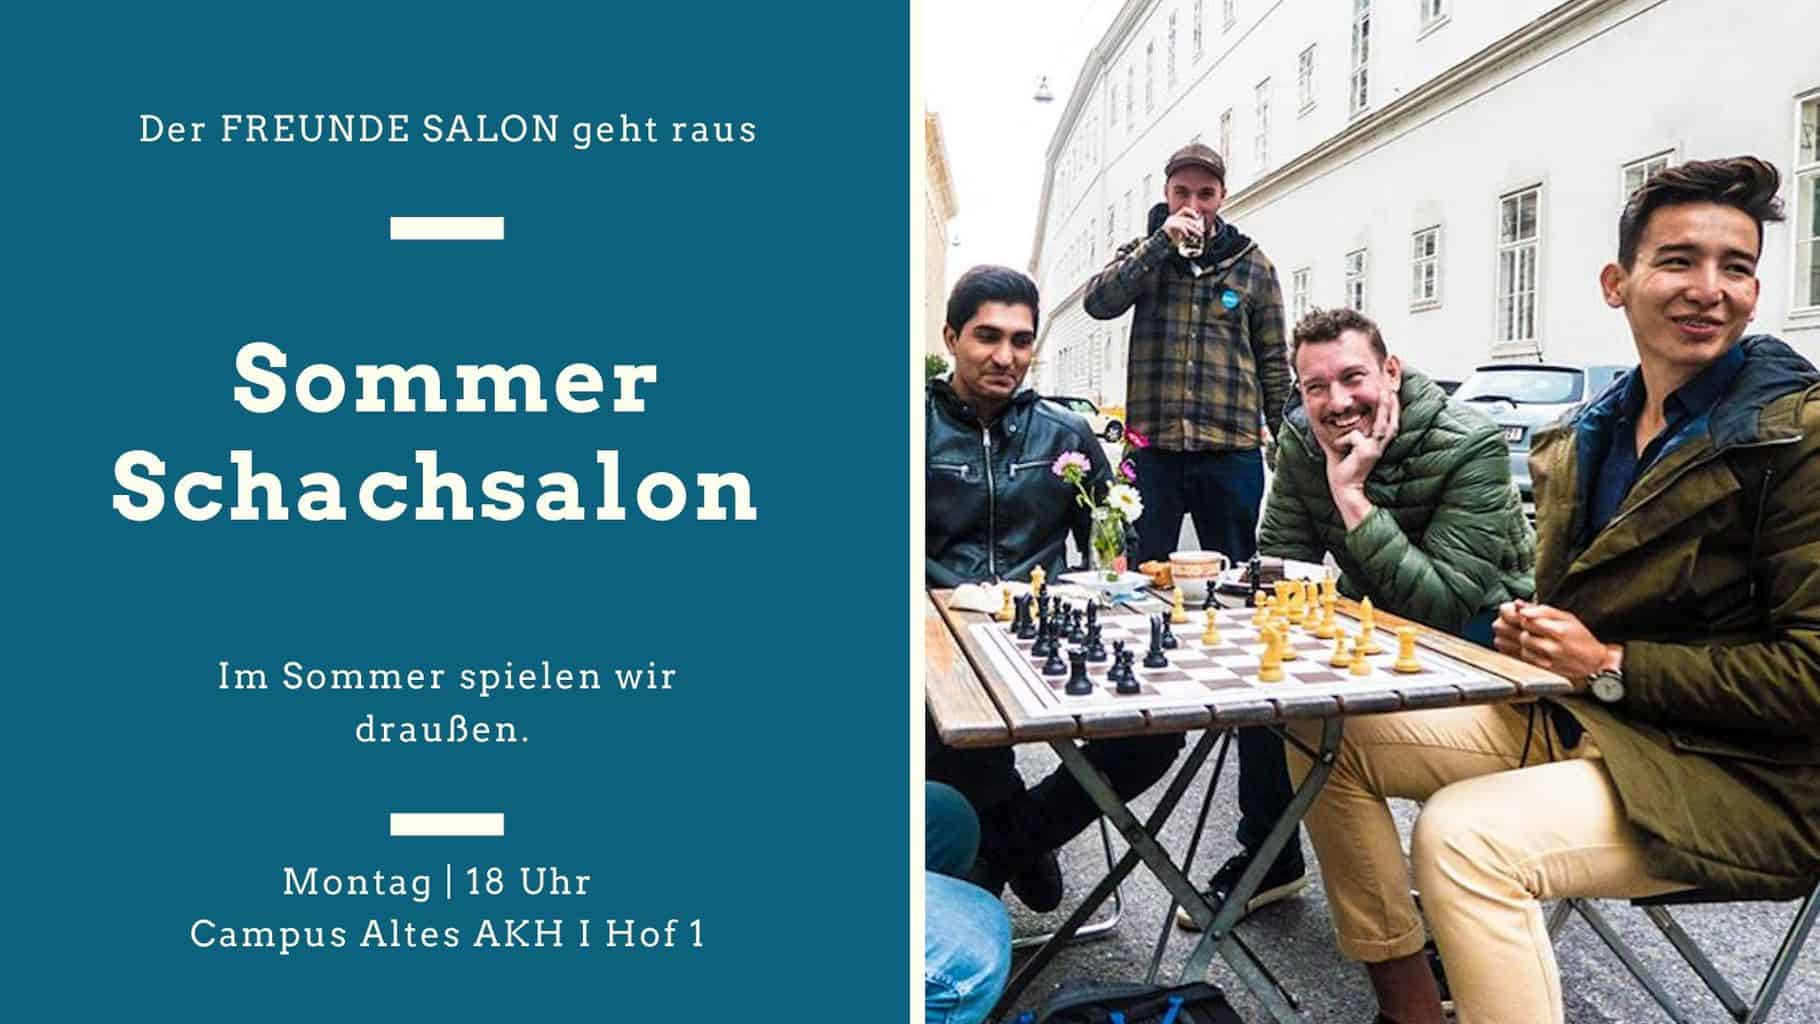 Immer Montags: Sommer Schachsalon